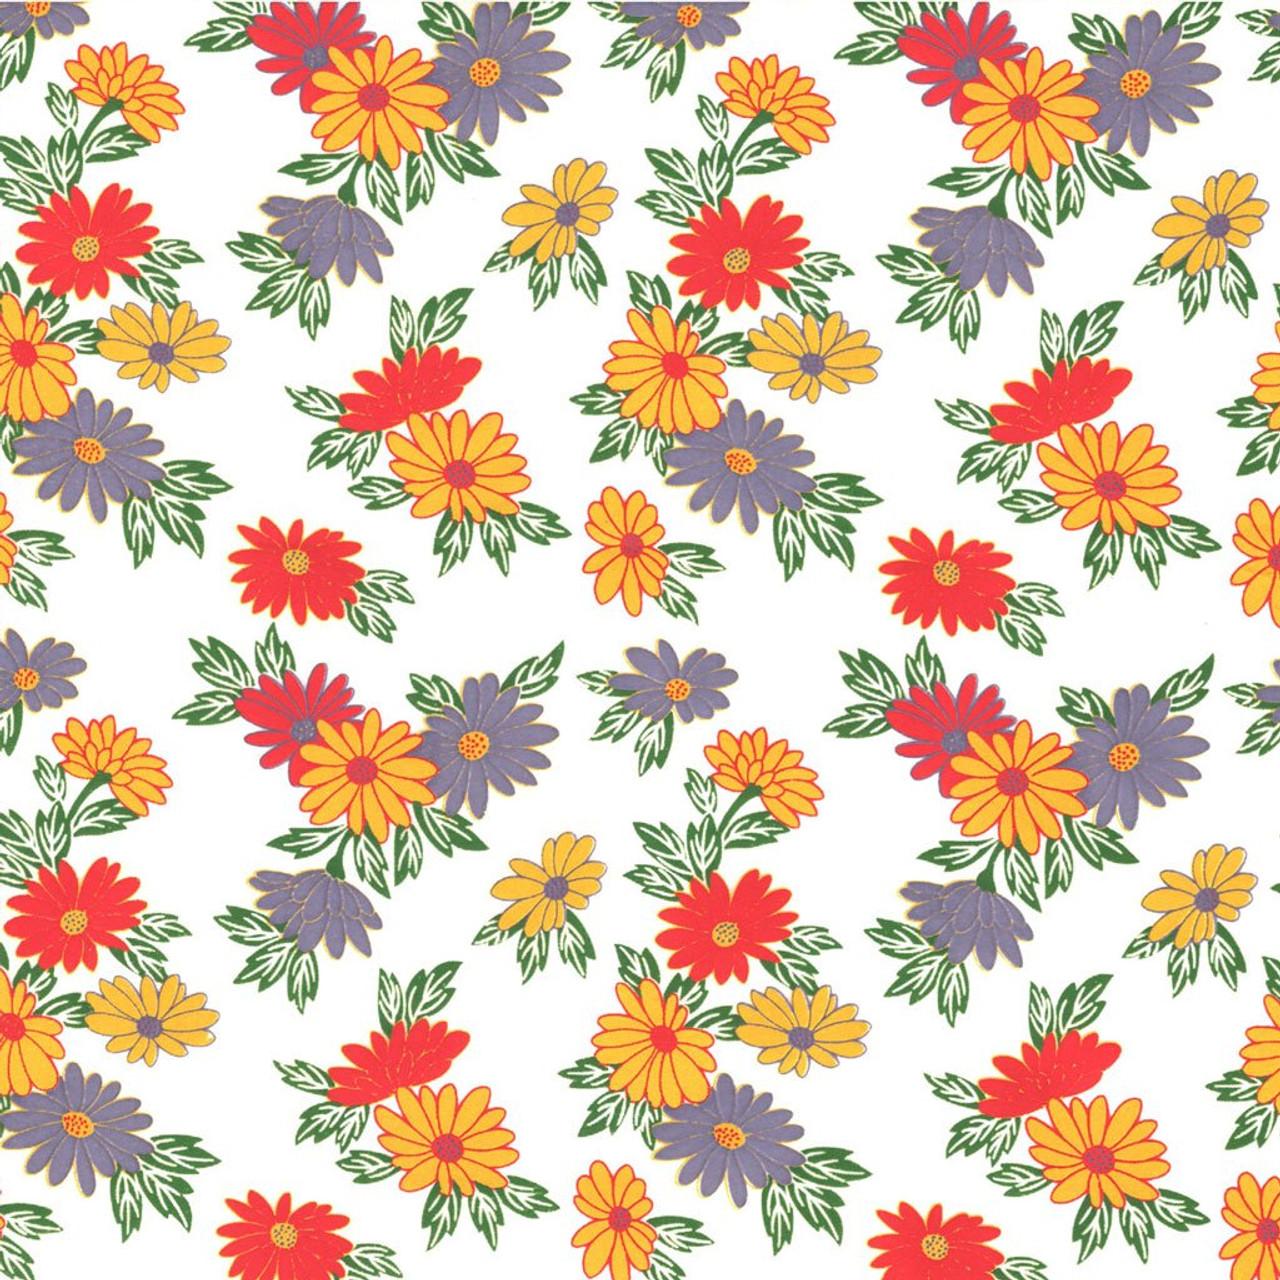 Sunflower Full Color UnderglazeTransfer19 x 13 in